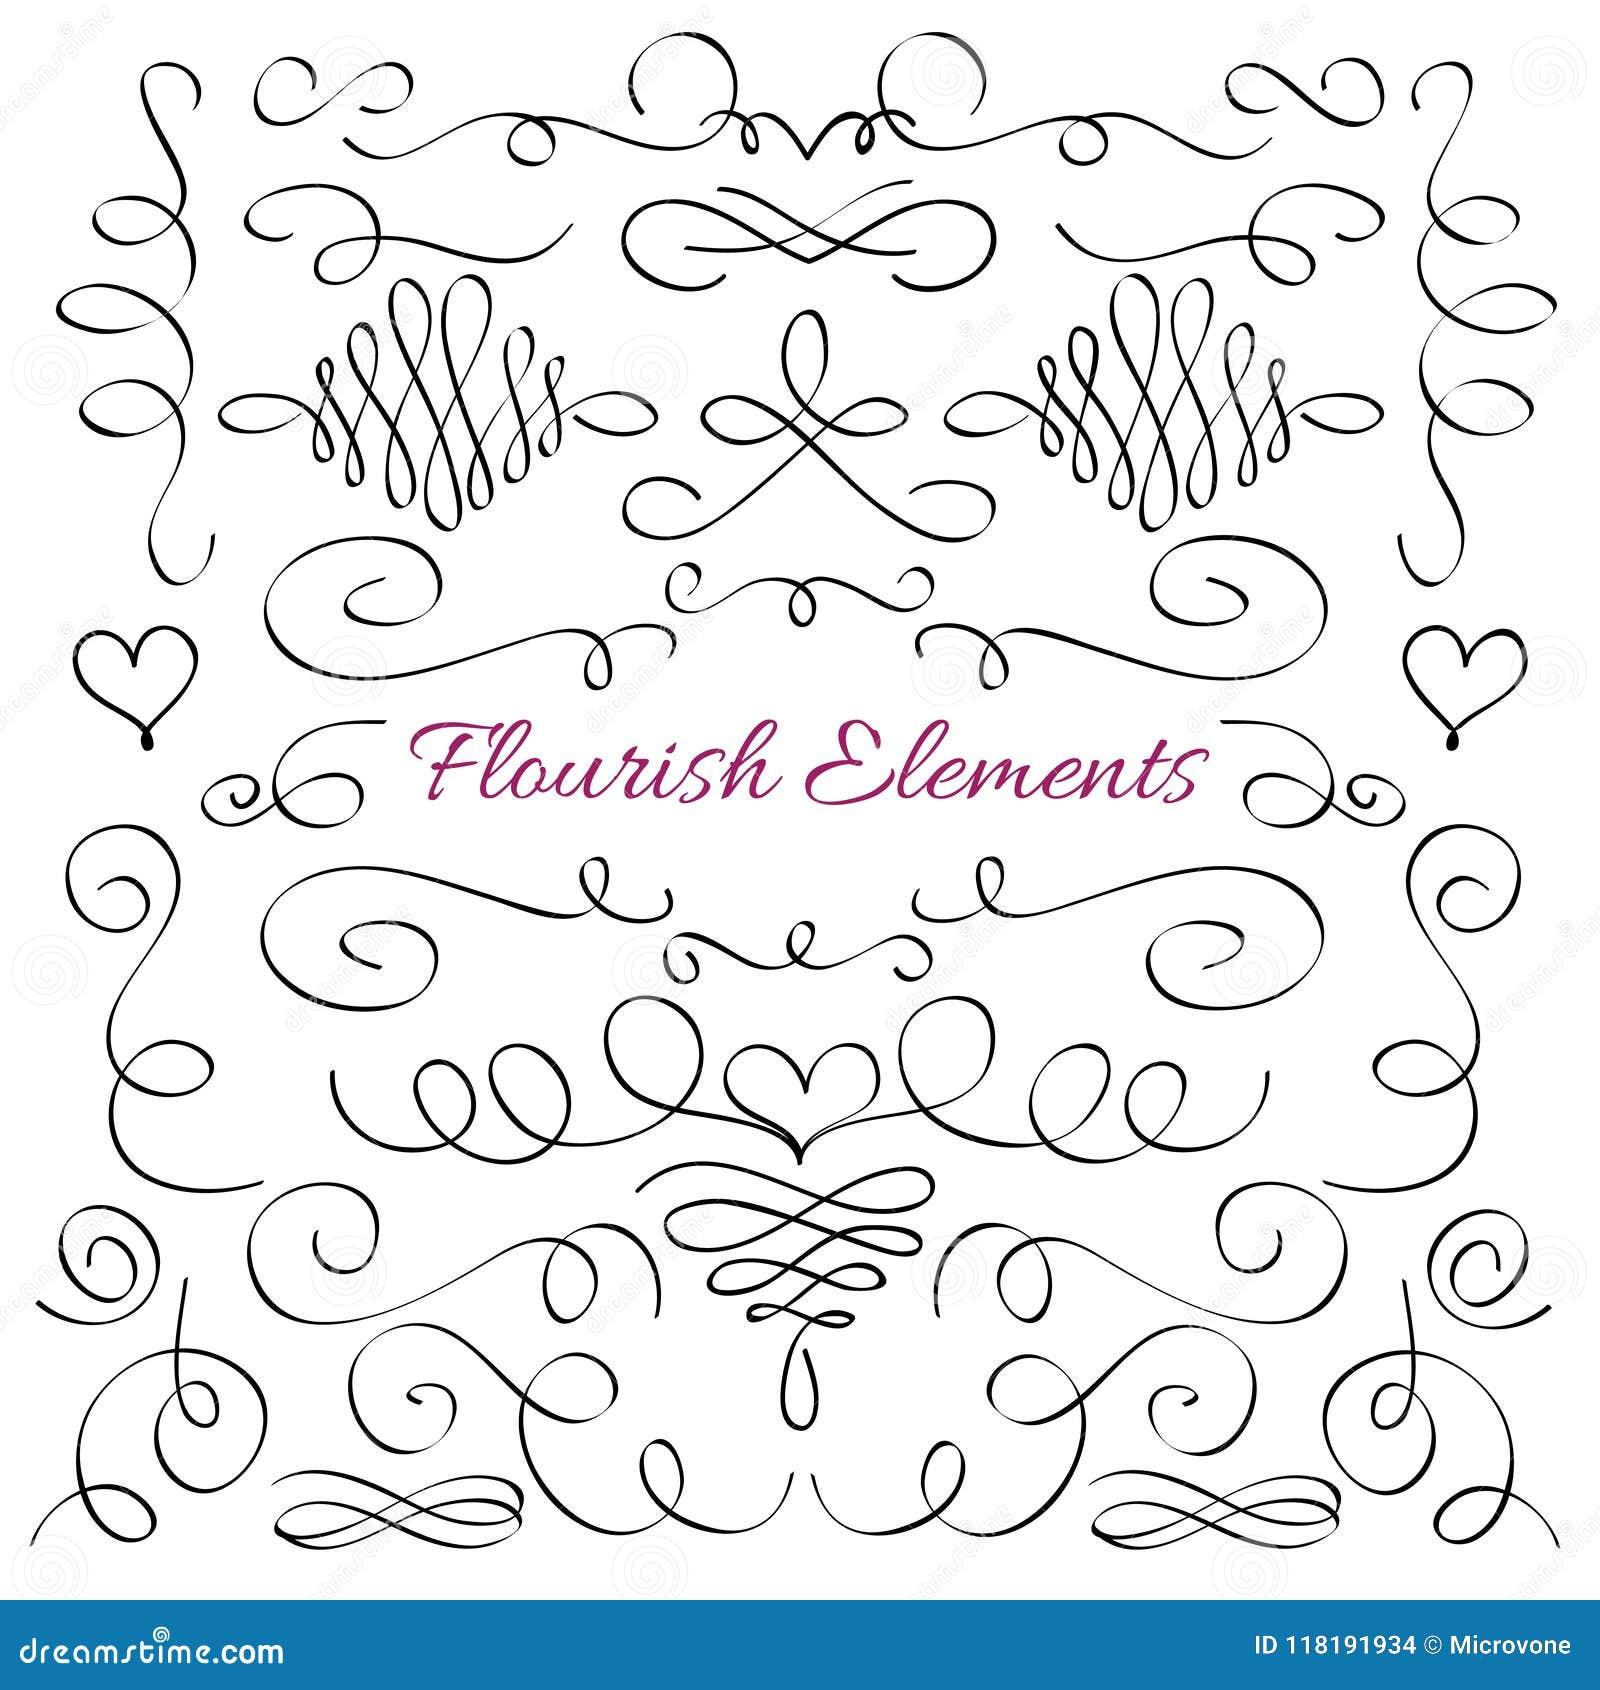 Classic elegant flourish decorative elements. Royal calligraphic swirls line vector collection